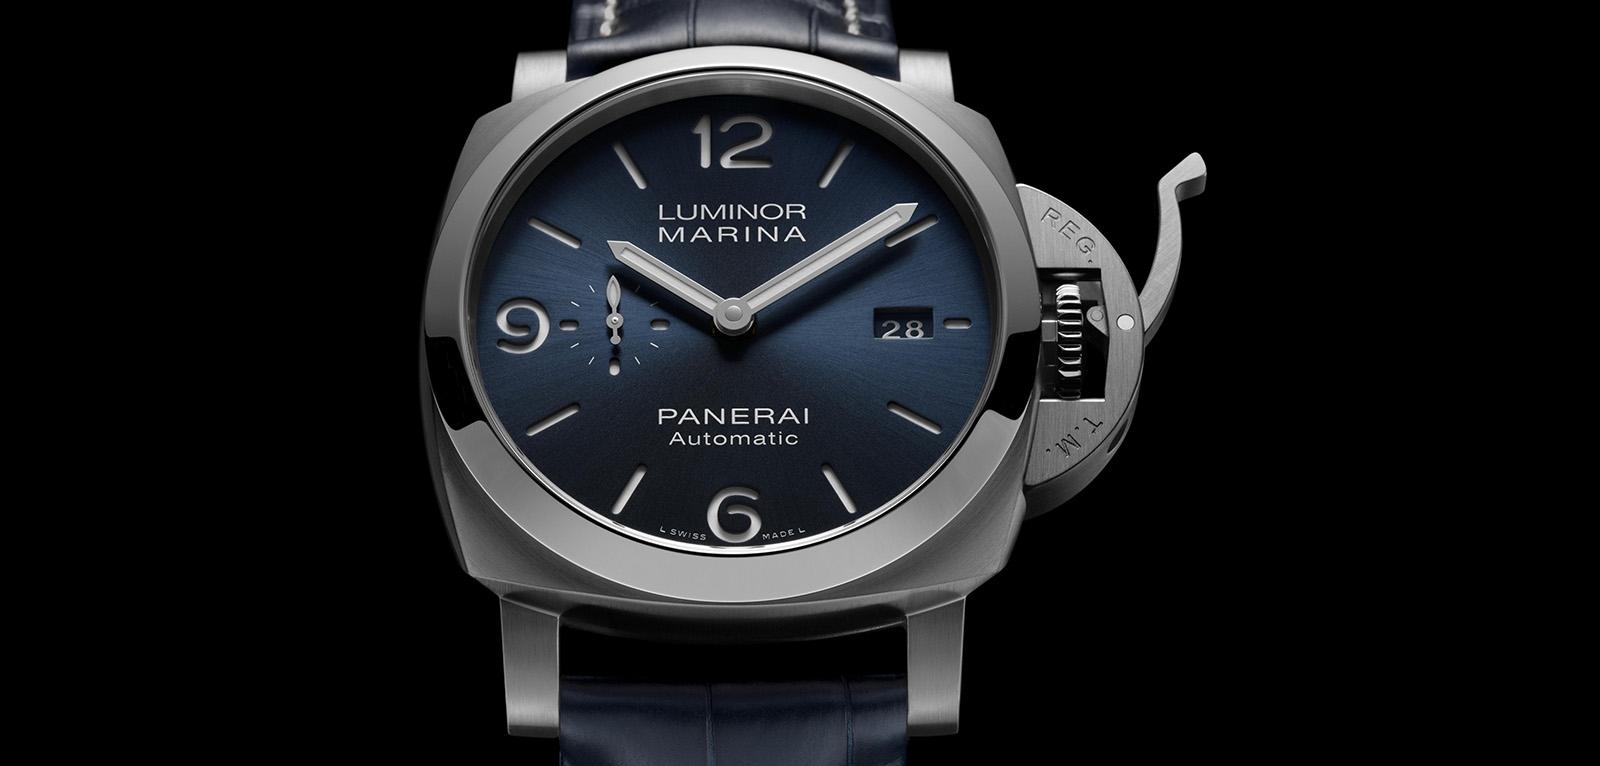 Panerai Luminor Marina: back to basics